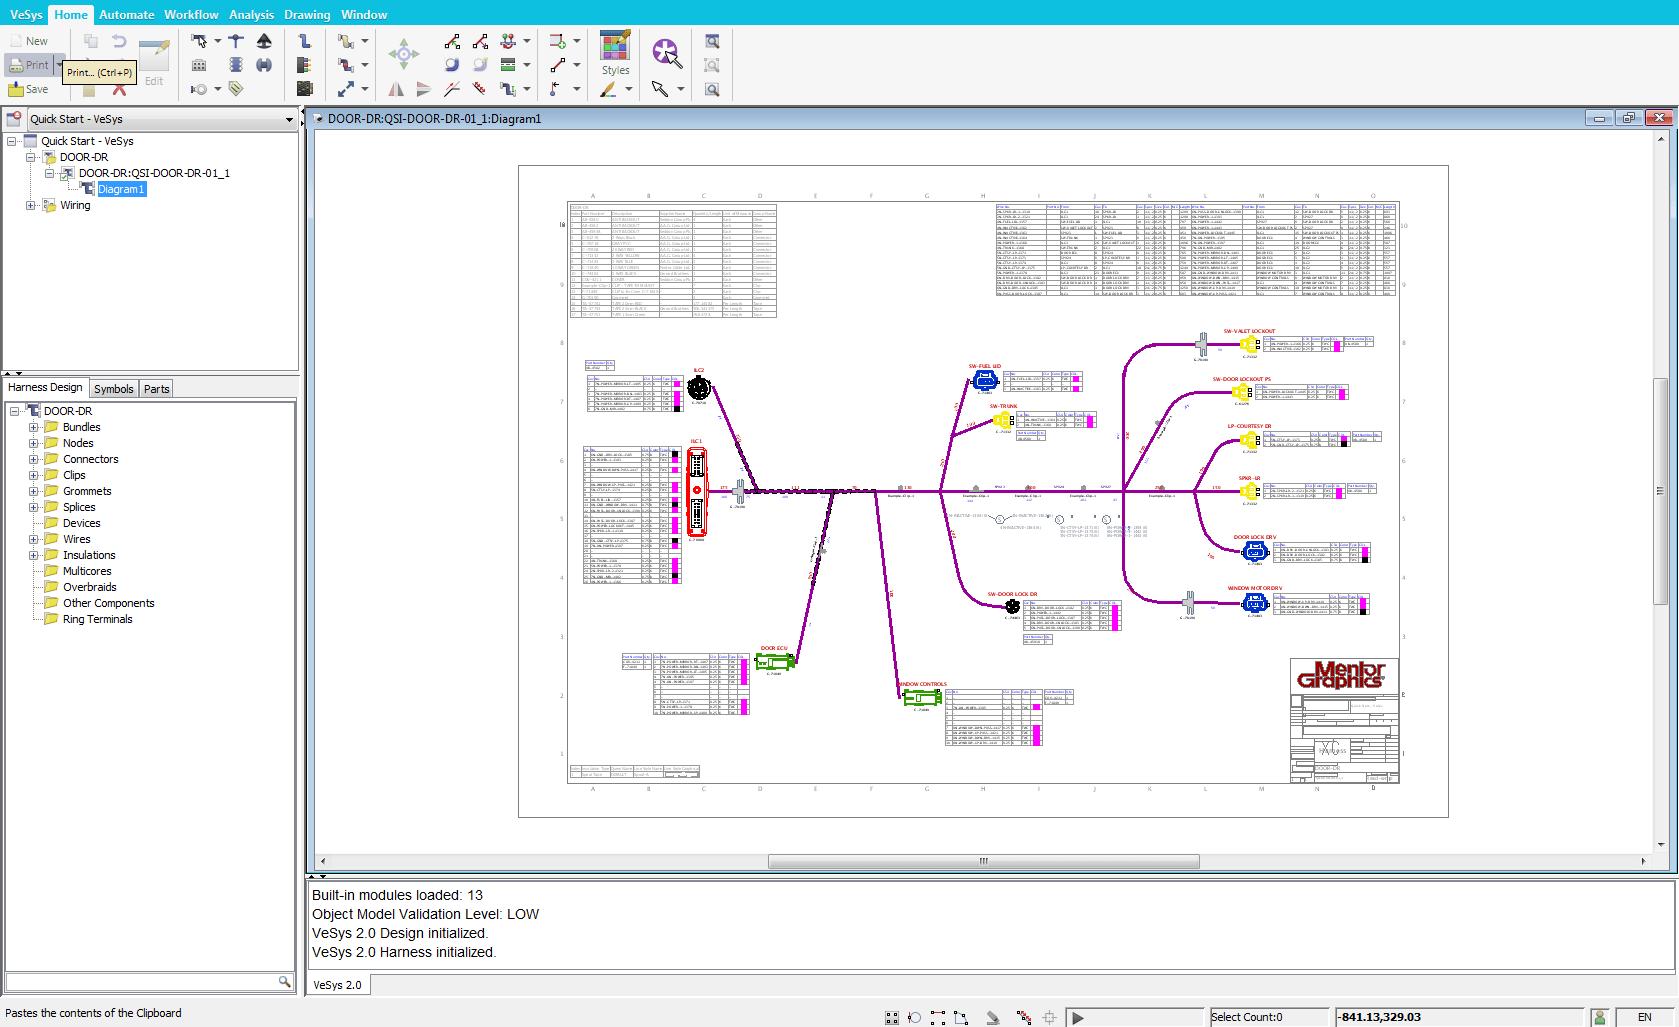 vesys harness rapid harness design completion [ 1679 x 1027 Pixel ]